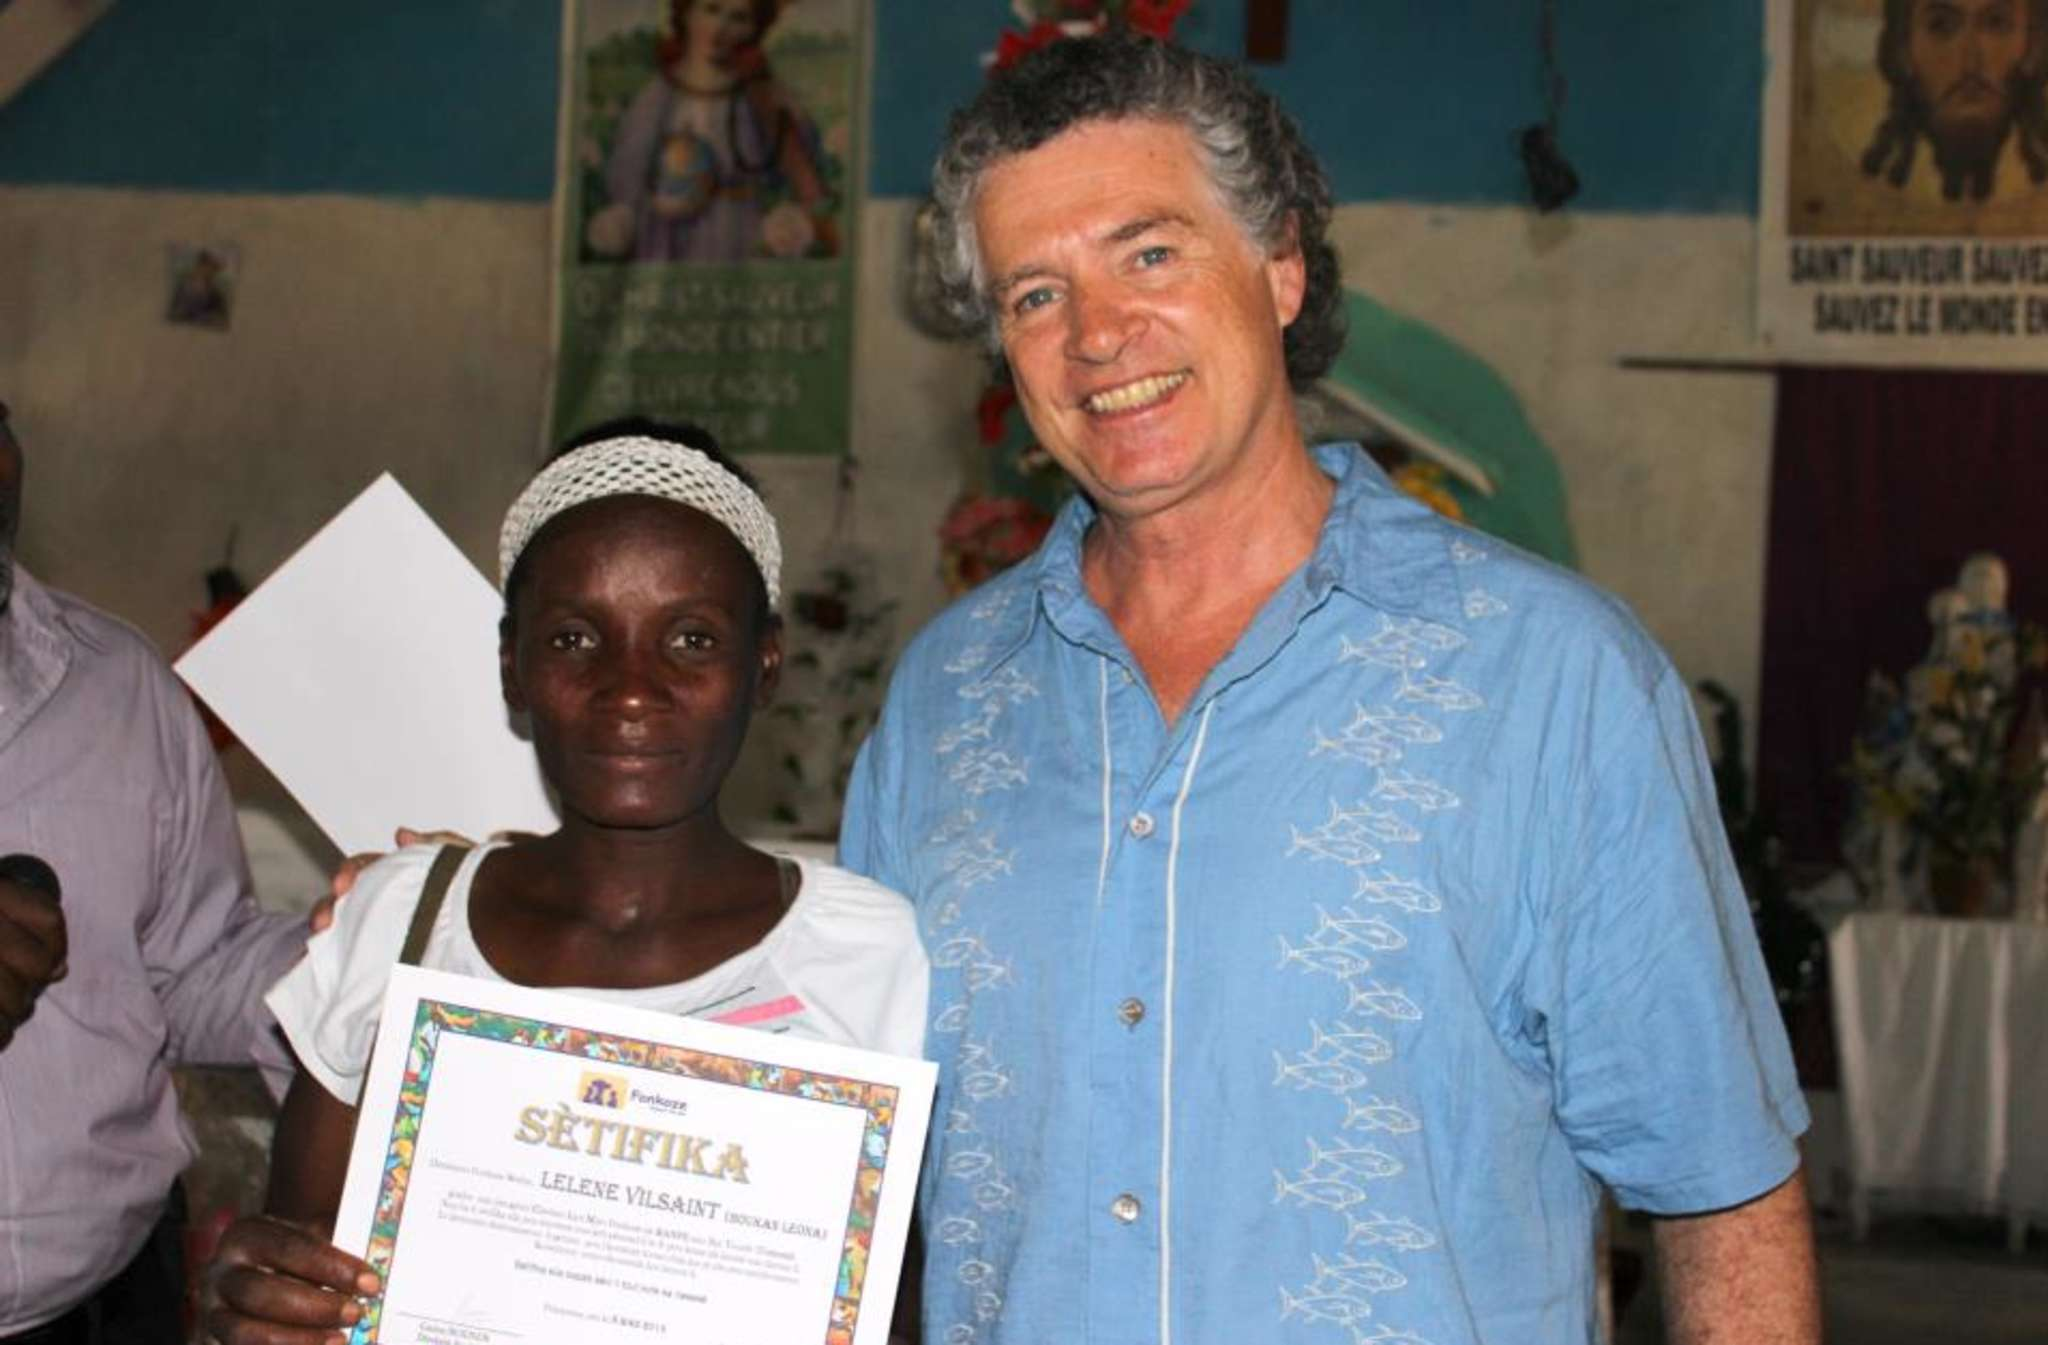 Matt Balitsaris, former chairman of Fonkoze USA, with Lilene Vilsaint, who graduated from the Fonkoze program in Bay Tourib, Haiti.